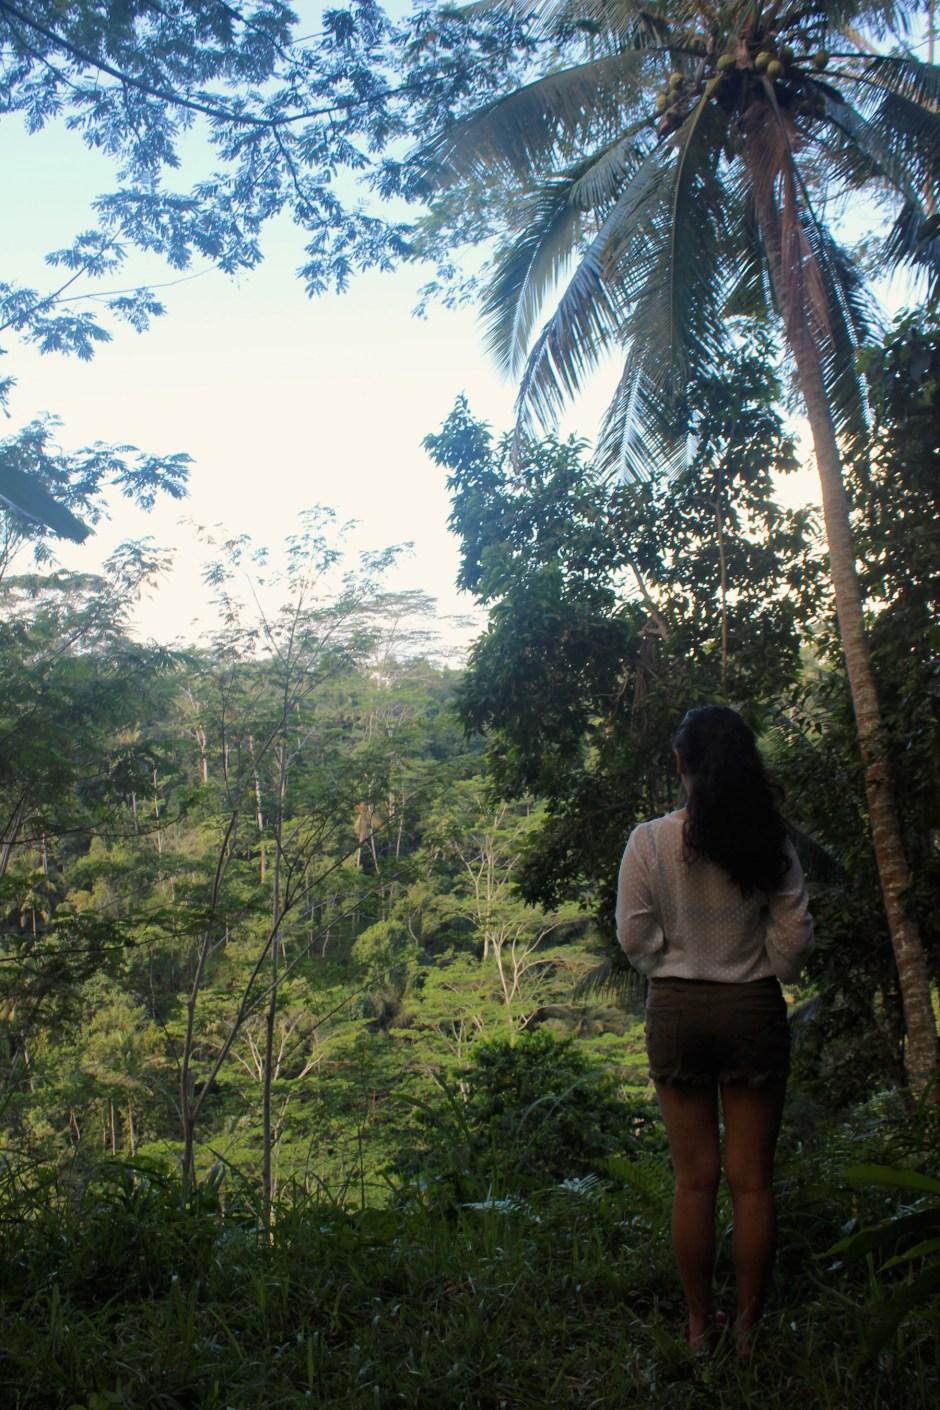 Somewhere in Ubud